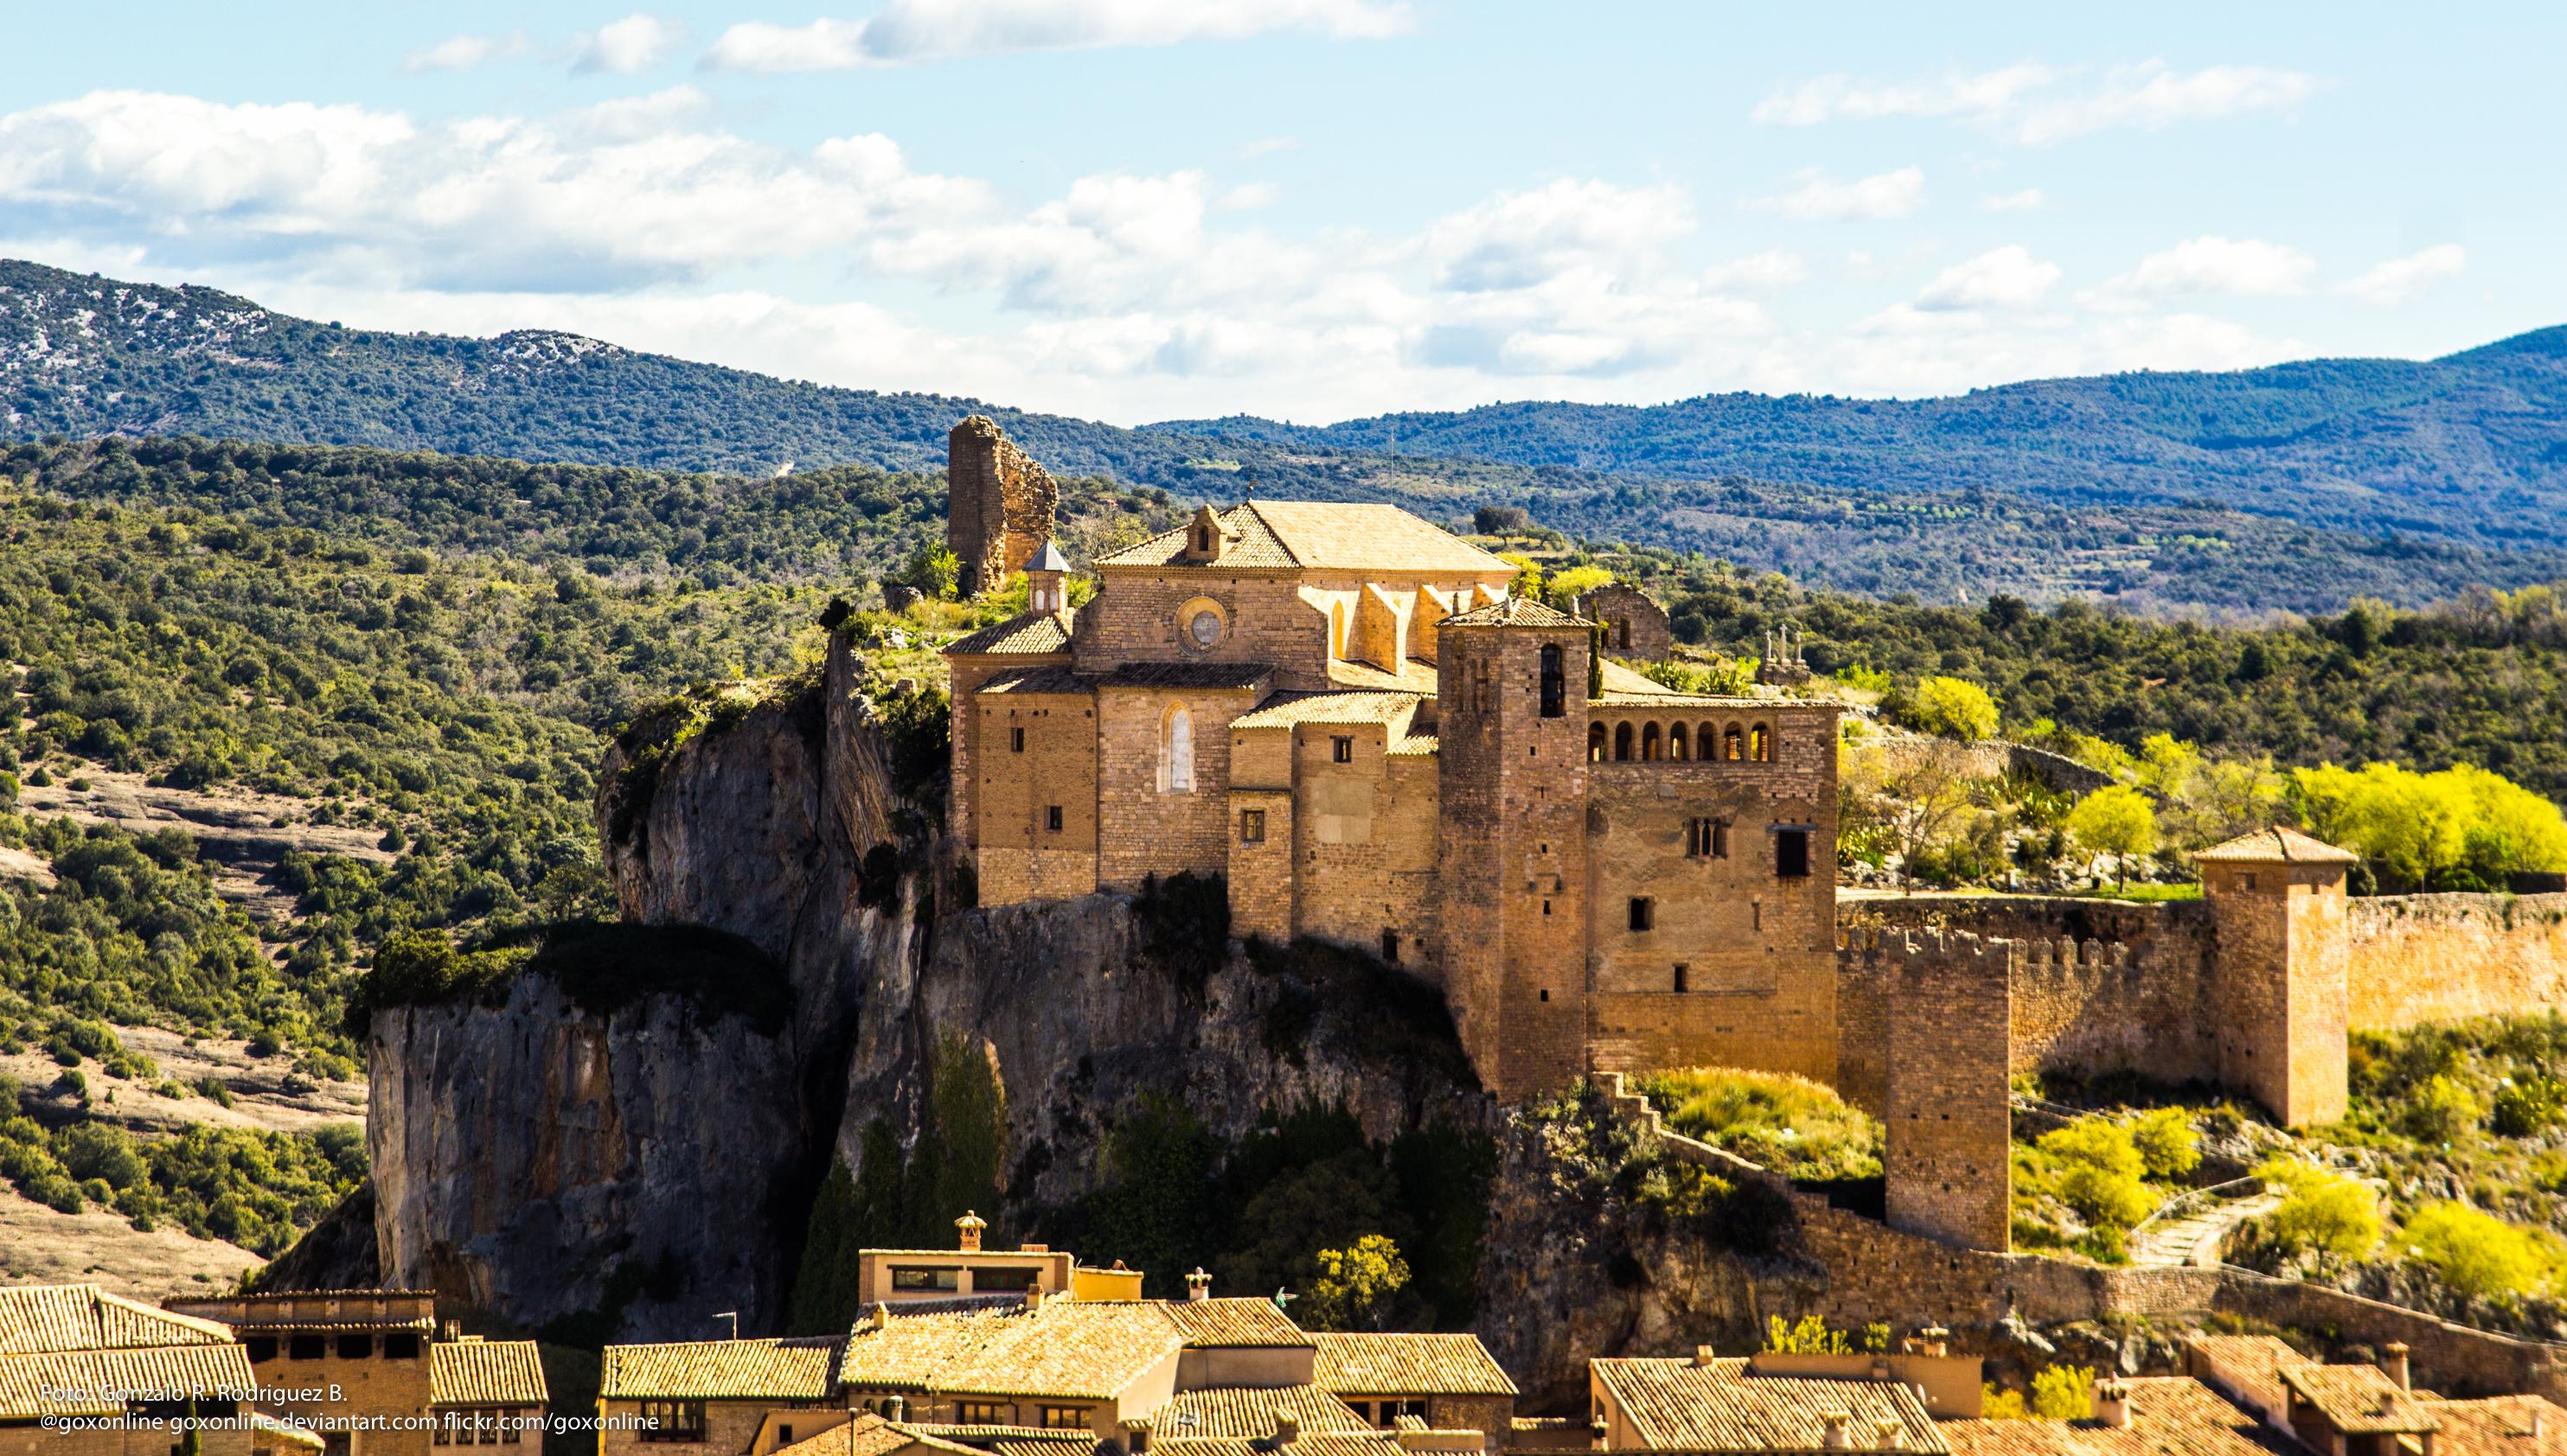 Vall de Nuria - image: 129432 - imgth | free images hosting